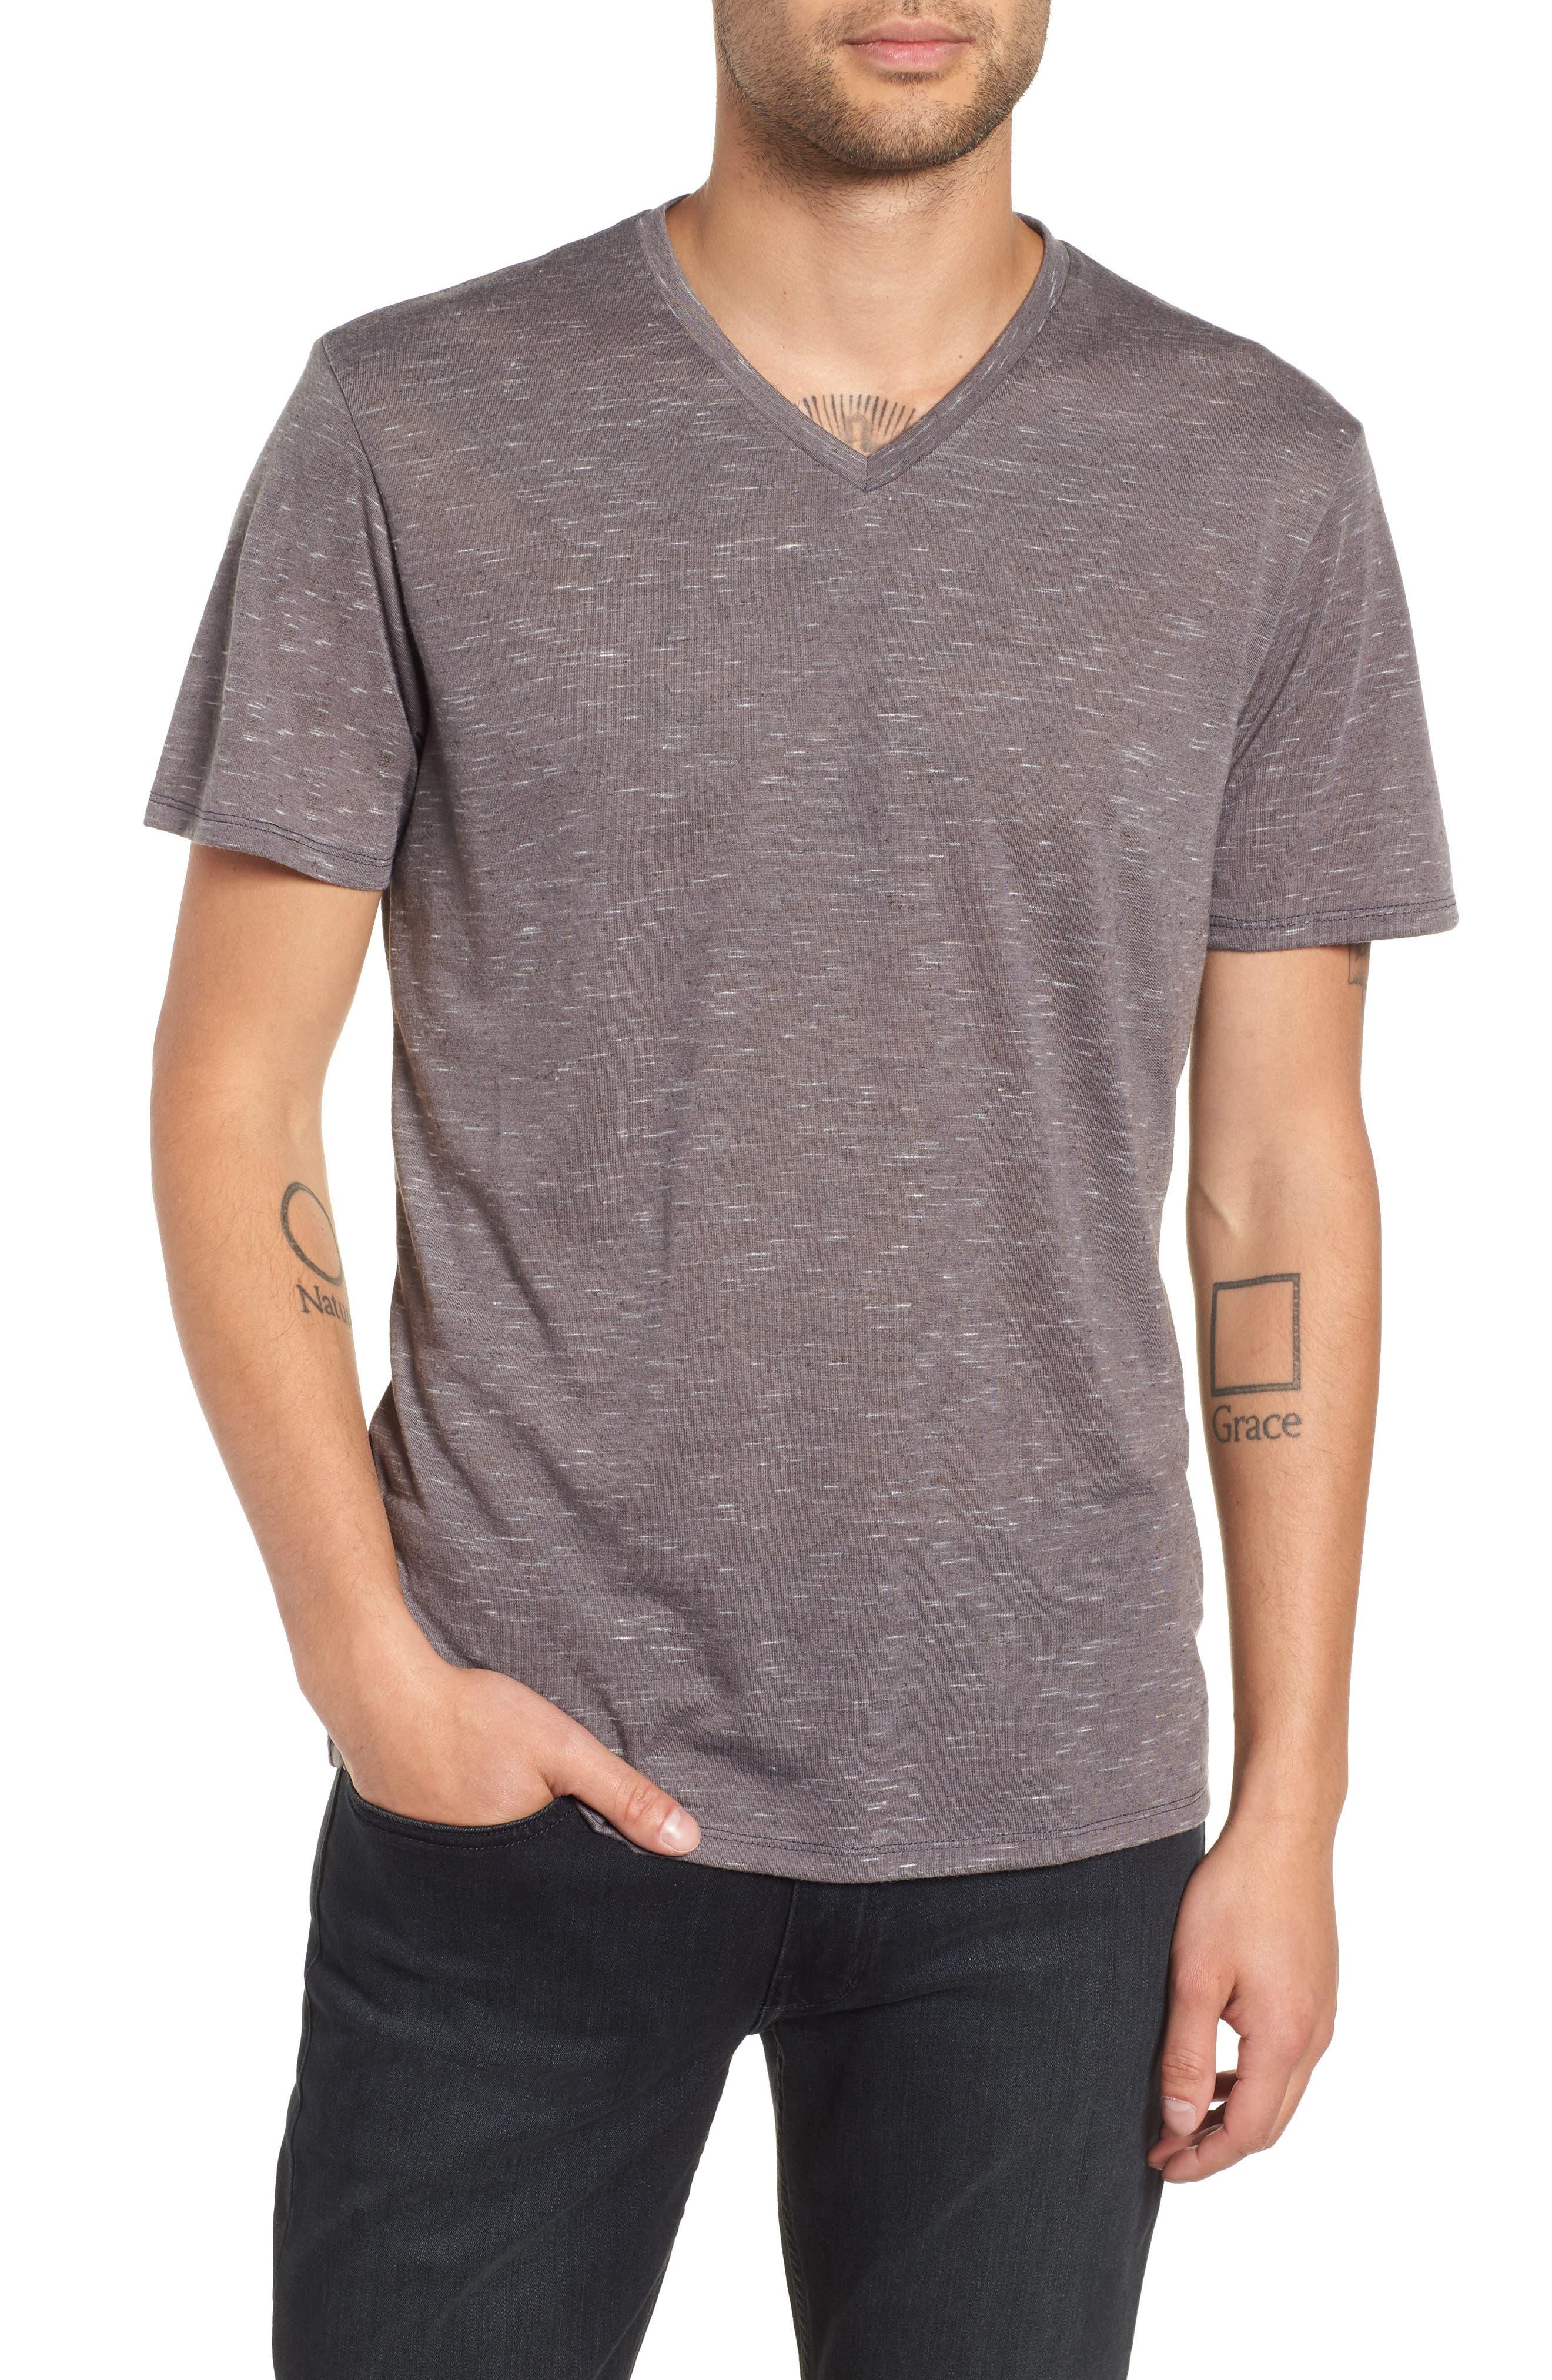 THE RAIL Streaky V-Neck T-Shirt, Main, color, GREY TORNADO- WHITE